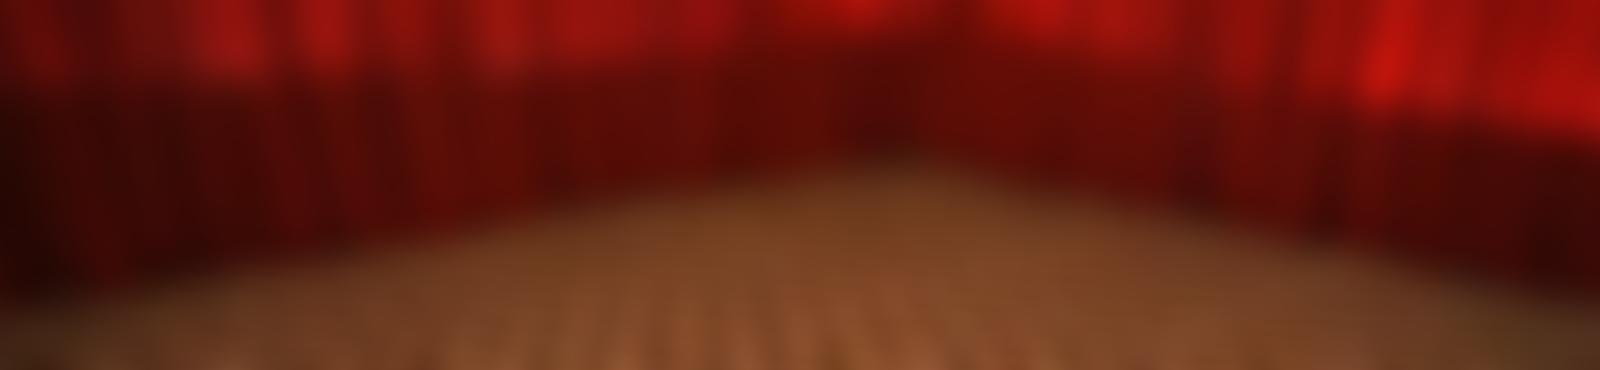 Blurred f81689d9 7eae 4923 823f 15e8c36b5a6a